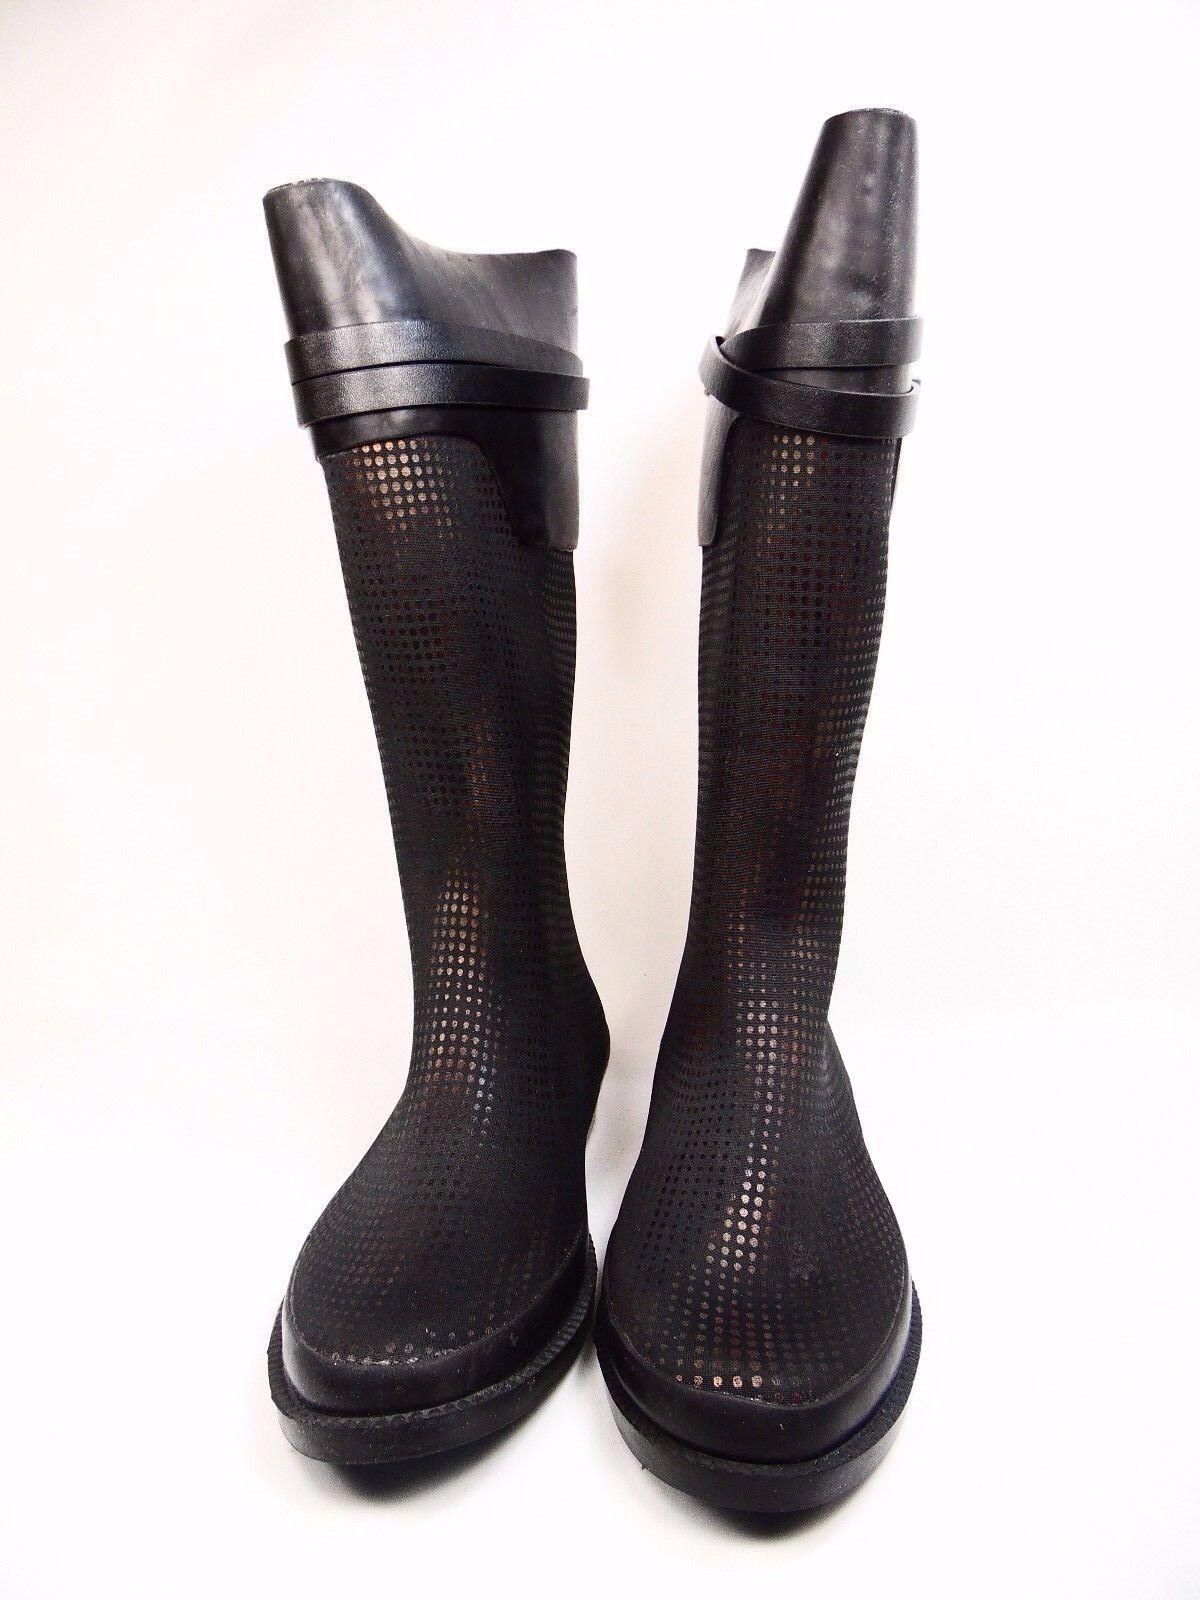 HENRY FERRERA AMBIANCE-200-05 Womens Ladies Boots  Black Bronze Size 9